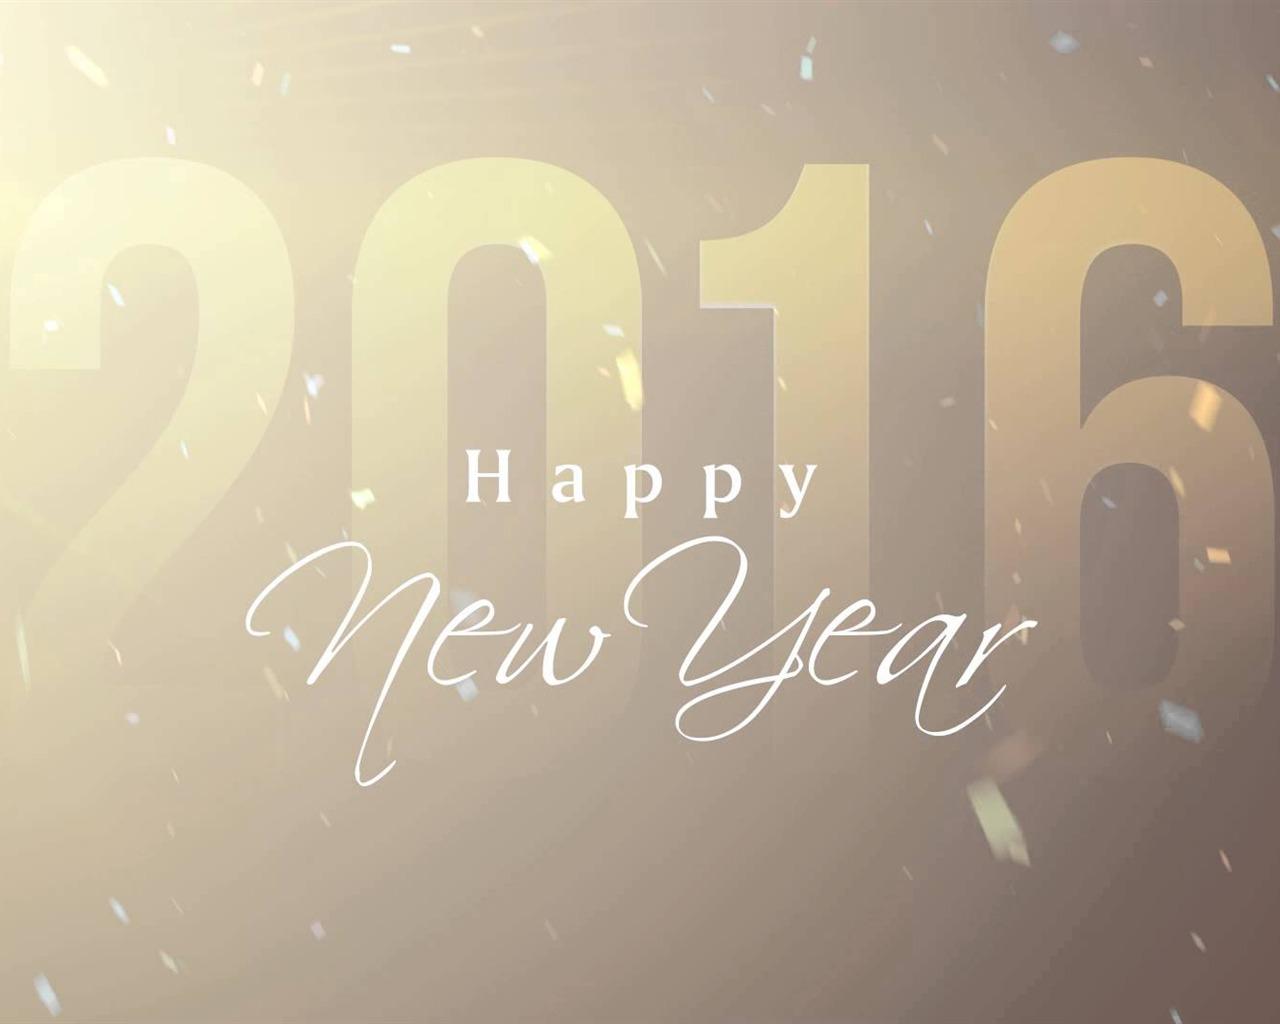 Happy New Year 2016 Hd Desktop Wallpaper 24 Preview 10wallpaper Com